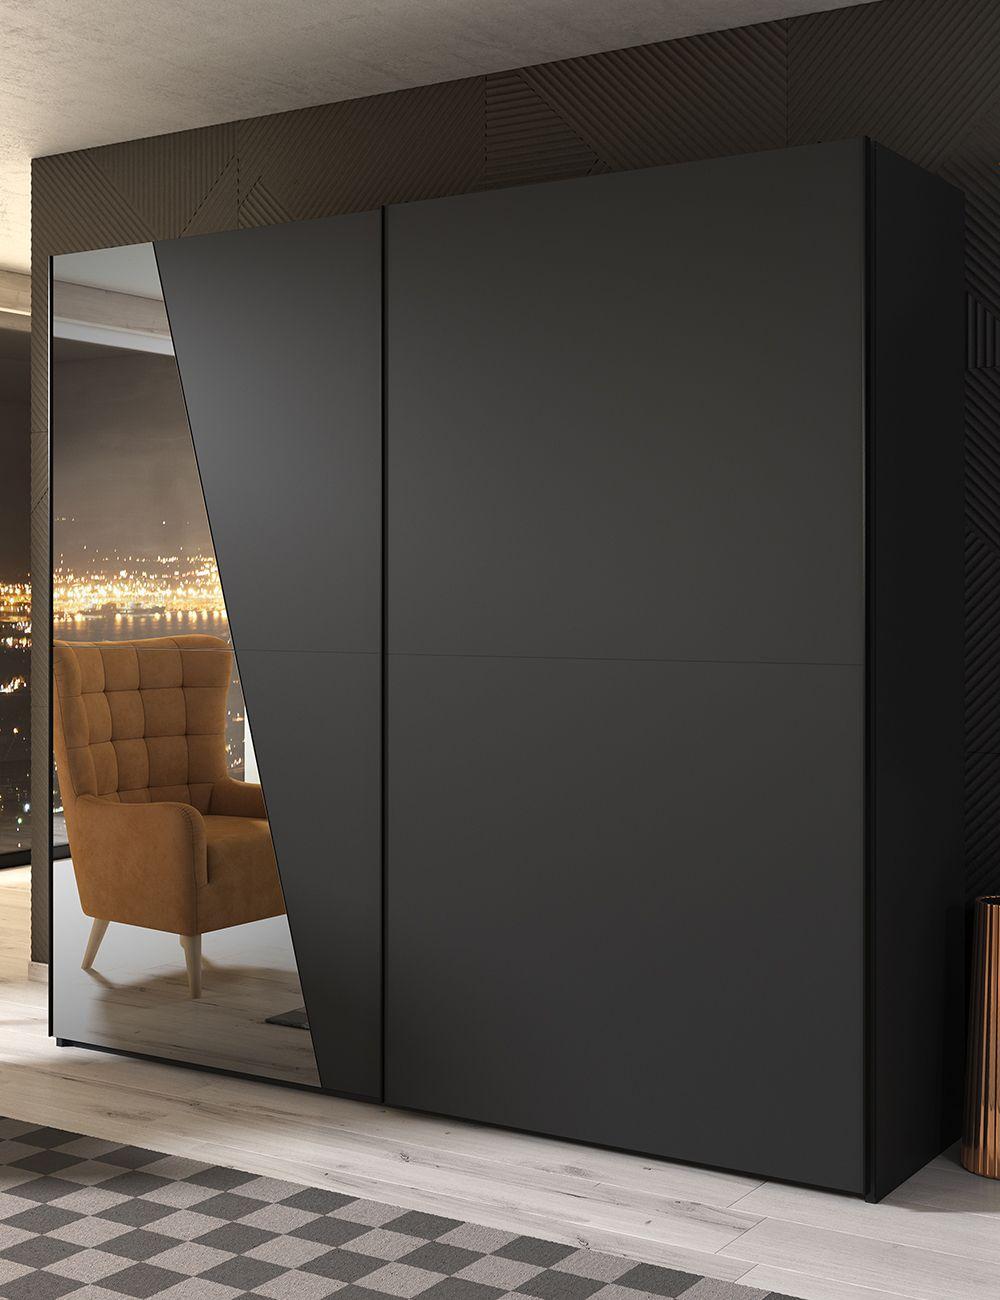 Kleiderschrank Sliding Door Wardrobe Designs Wardrobe Design Bedroom Modern Cupboard Design